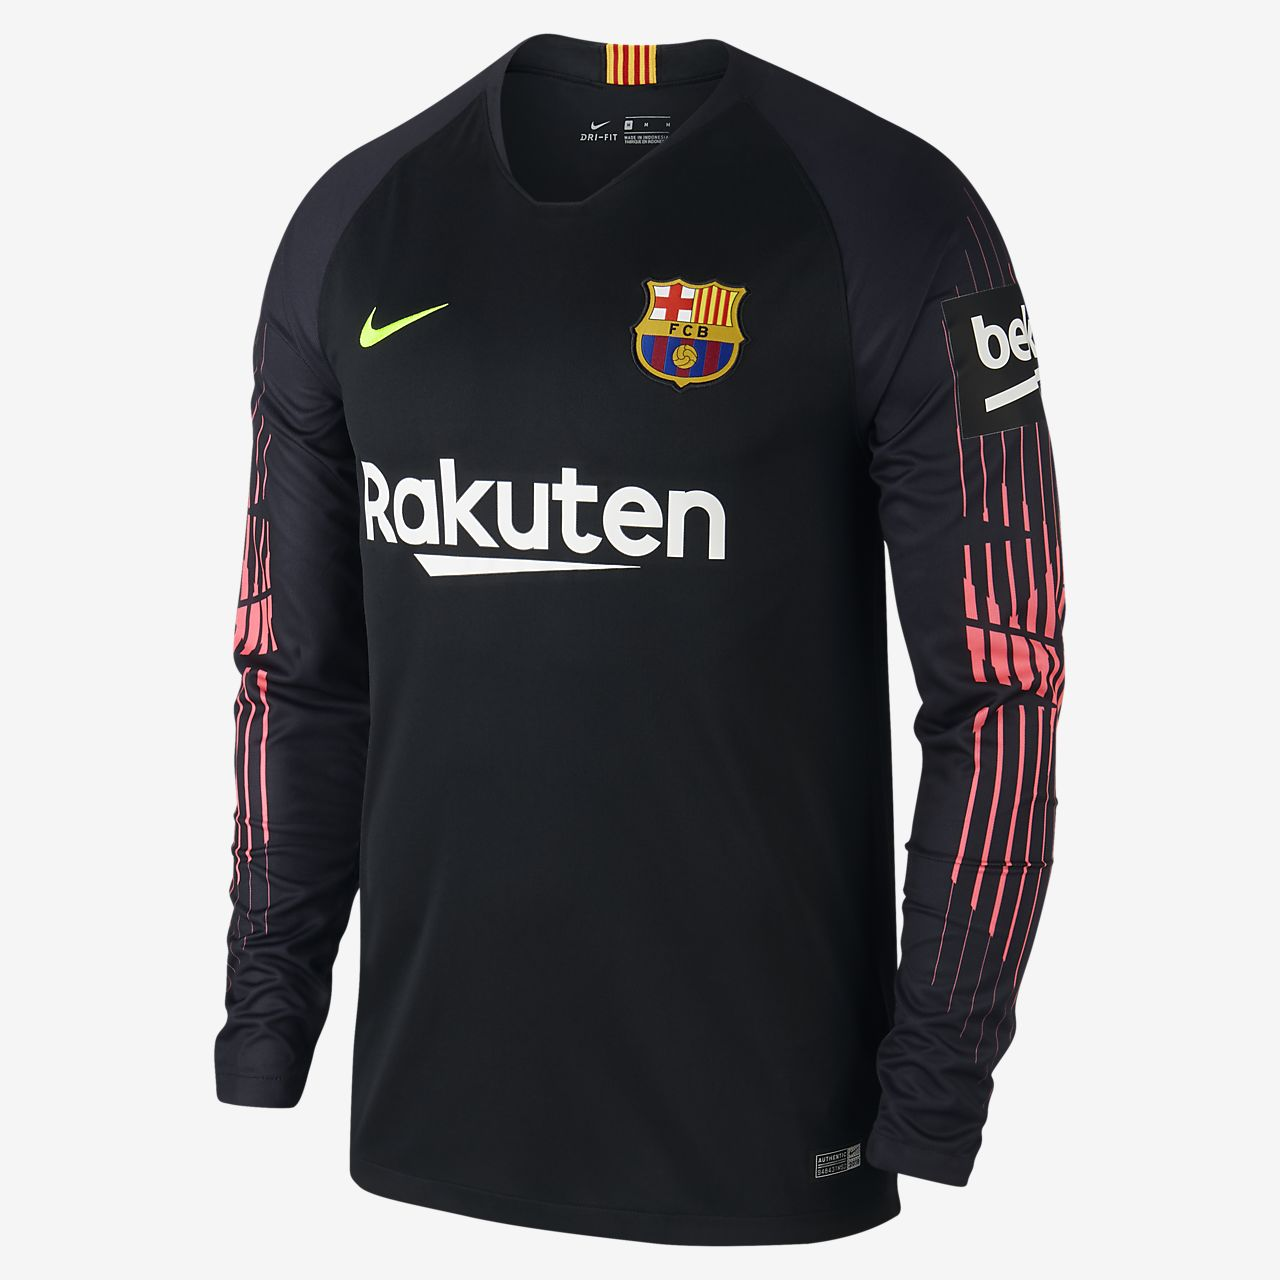 Maglia da calcio 2018/19 FC Barcelona Stadium Goalkeeper - Uomo